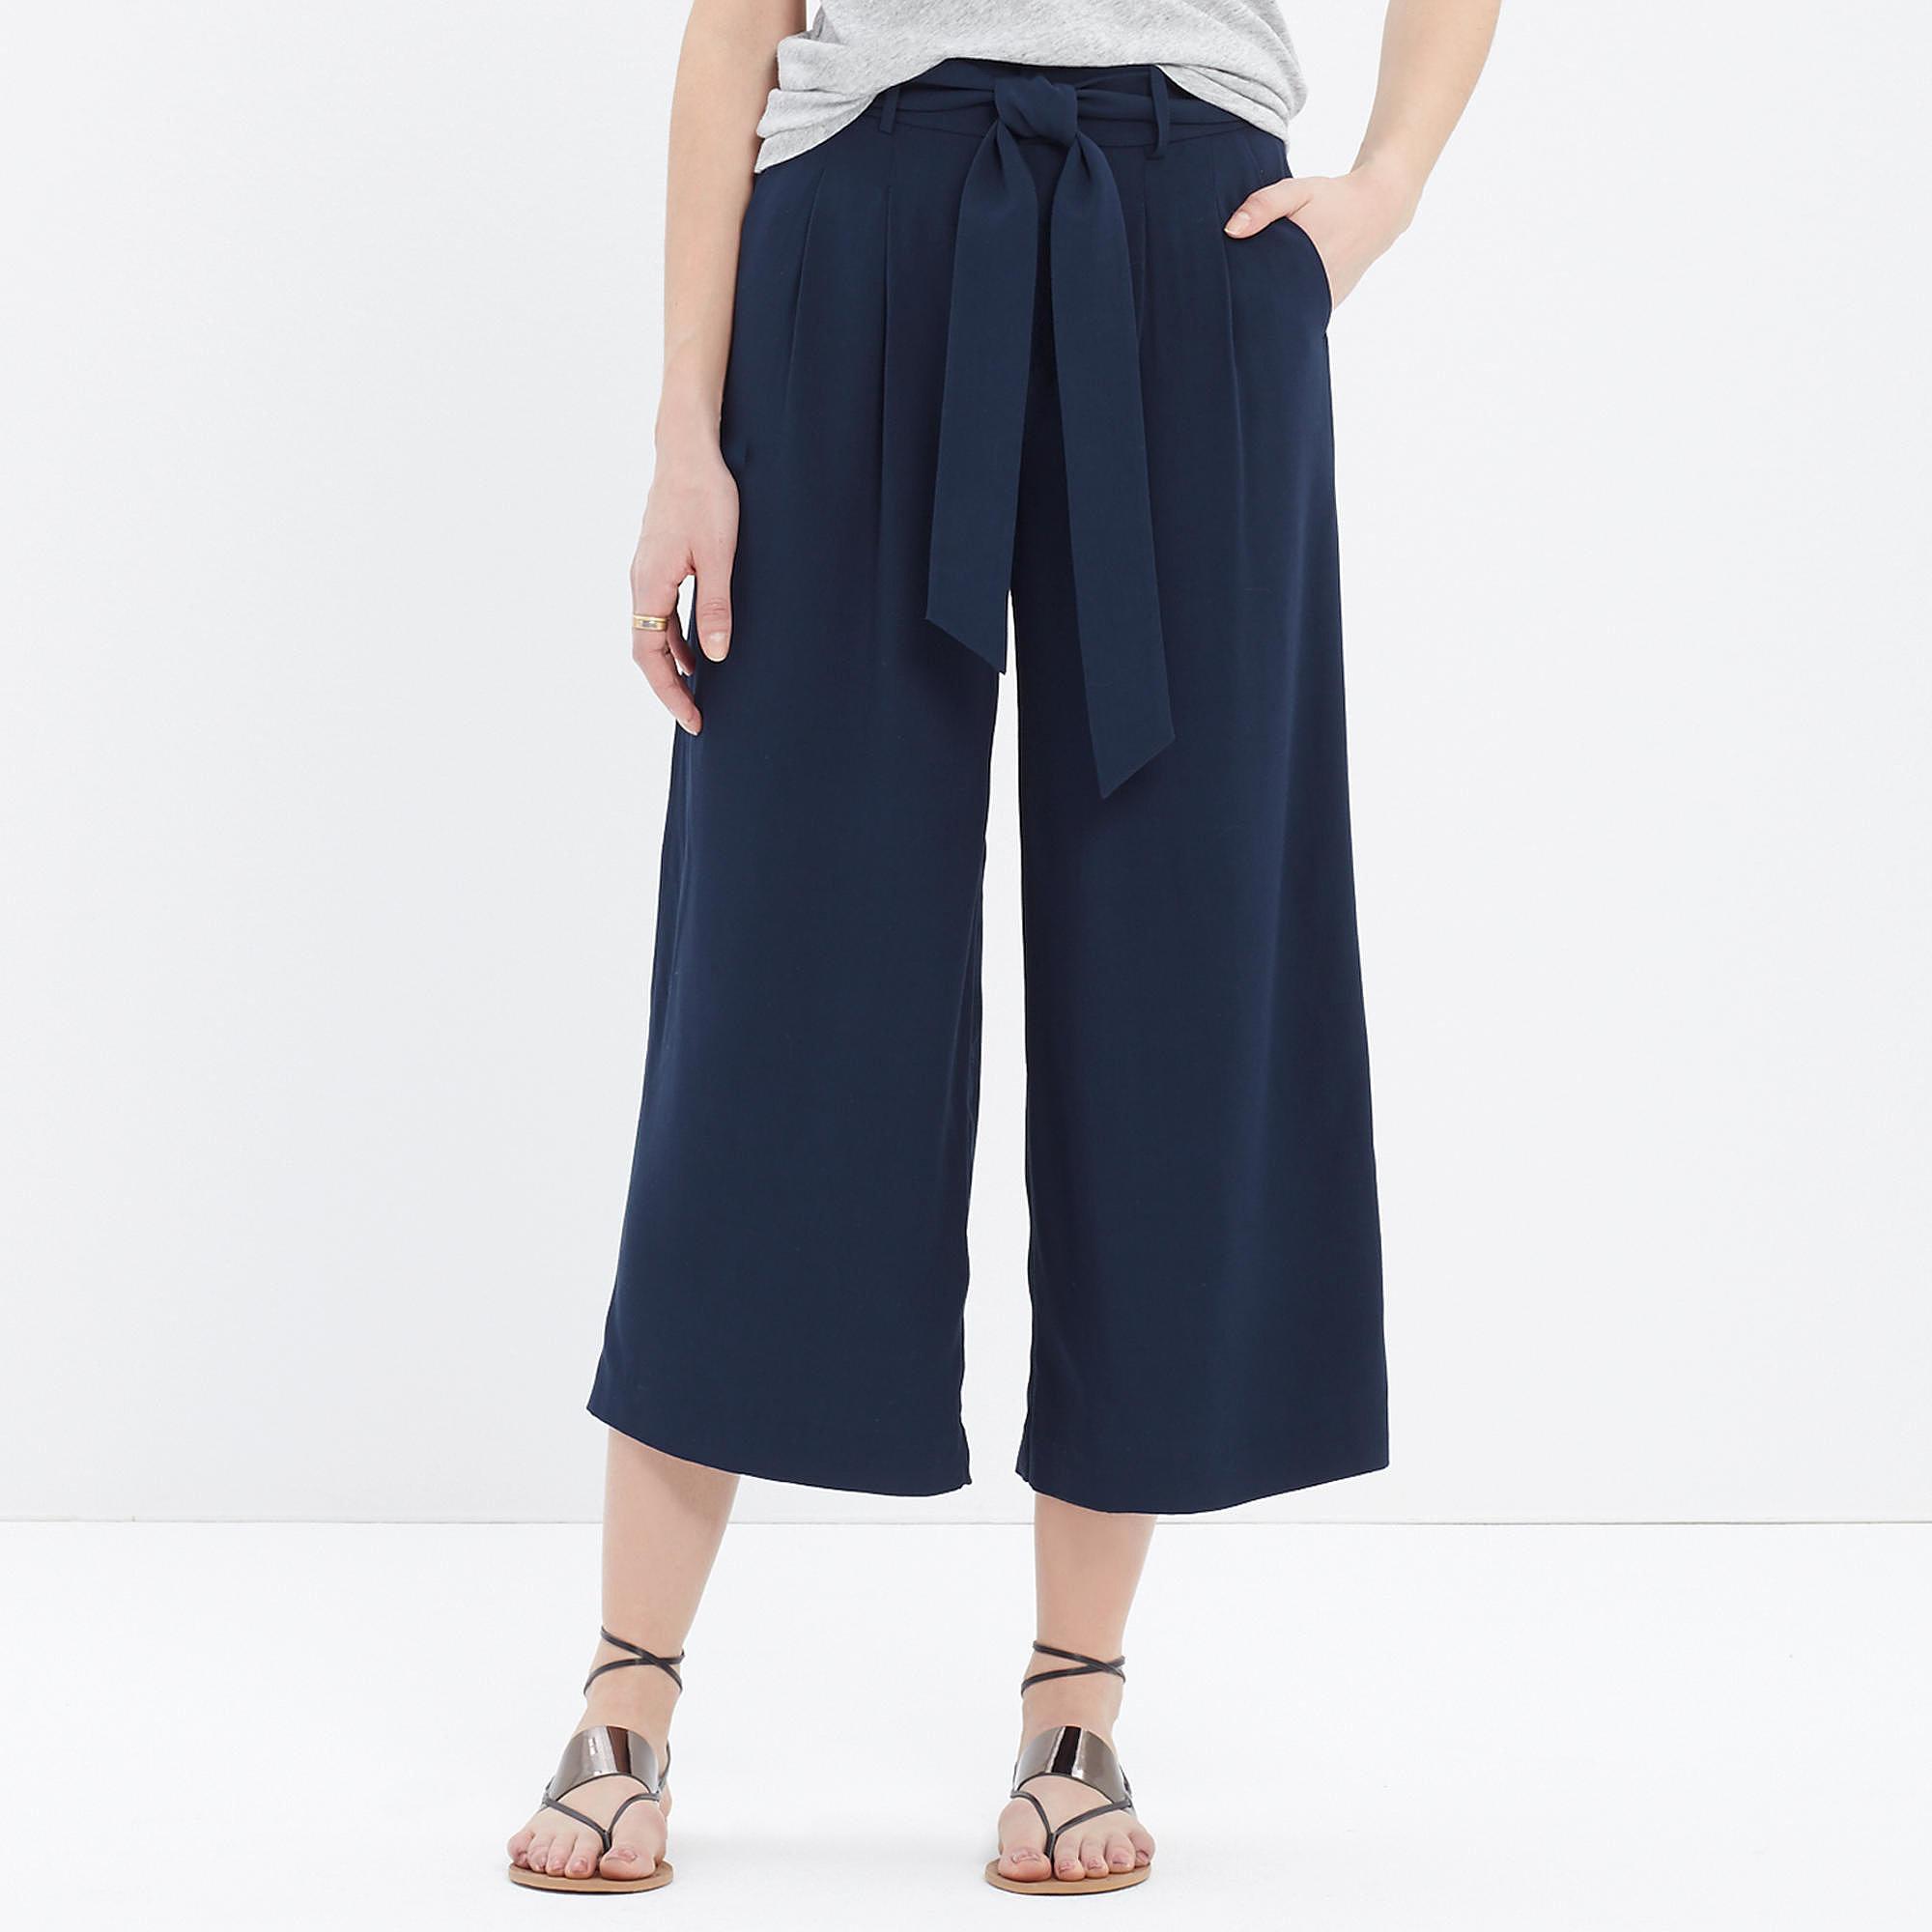 Madewell Minetta Trousers ($110)